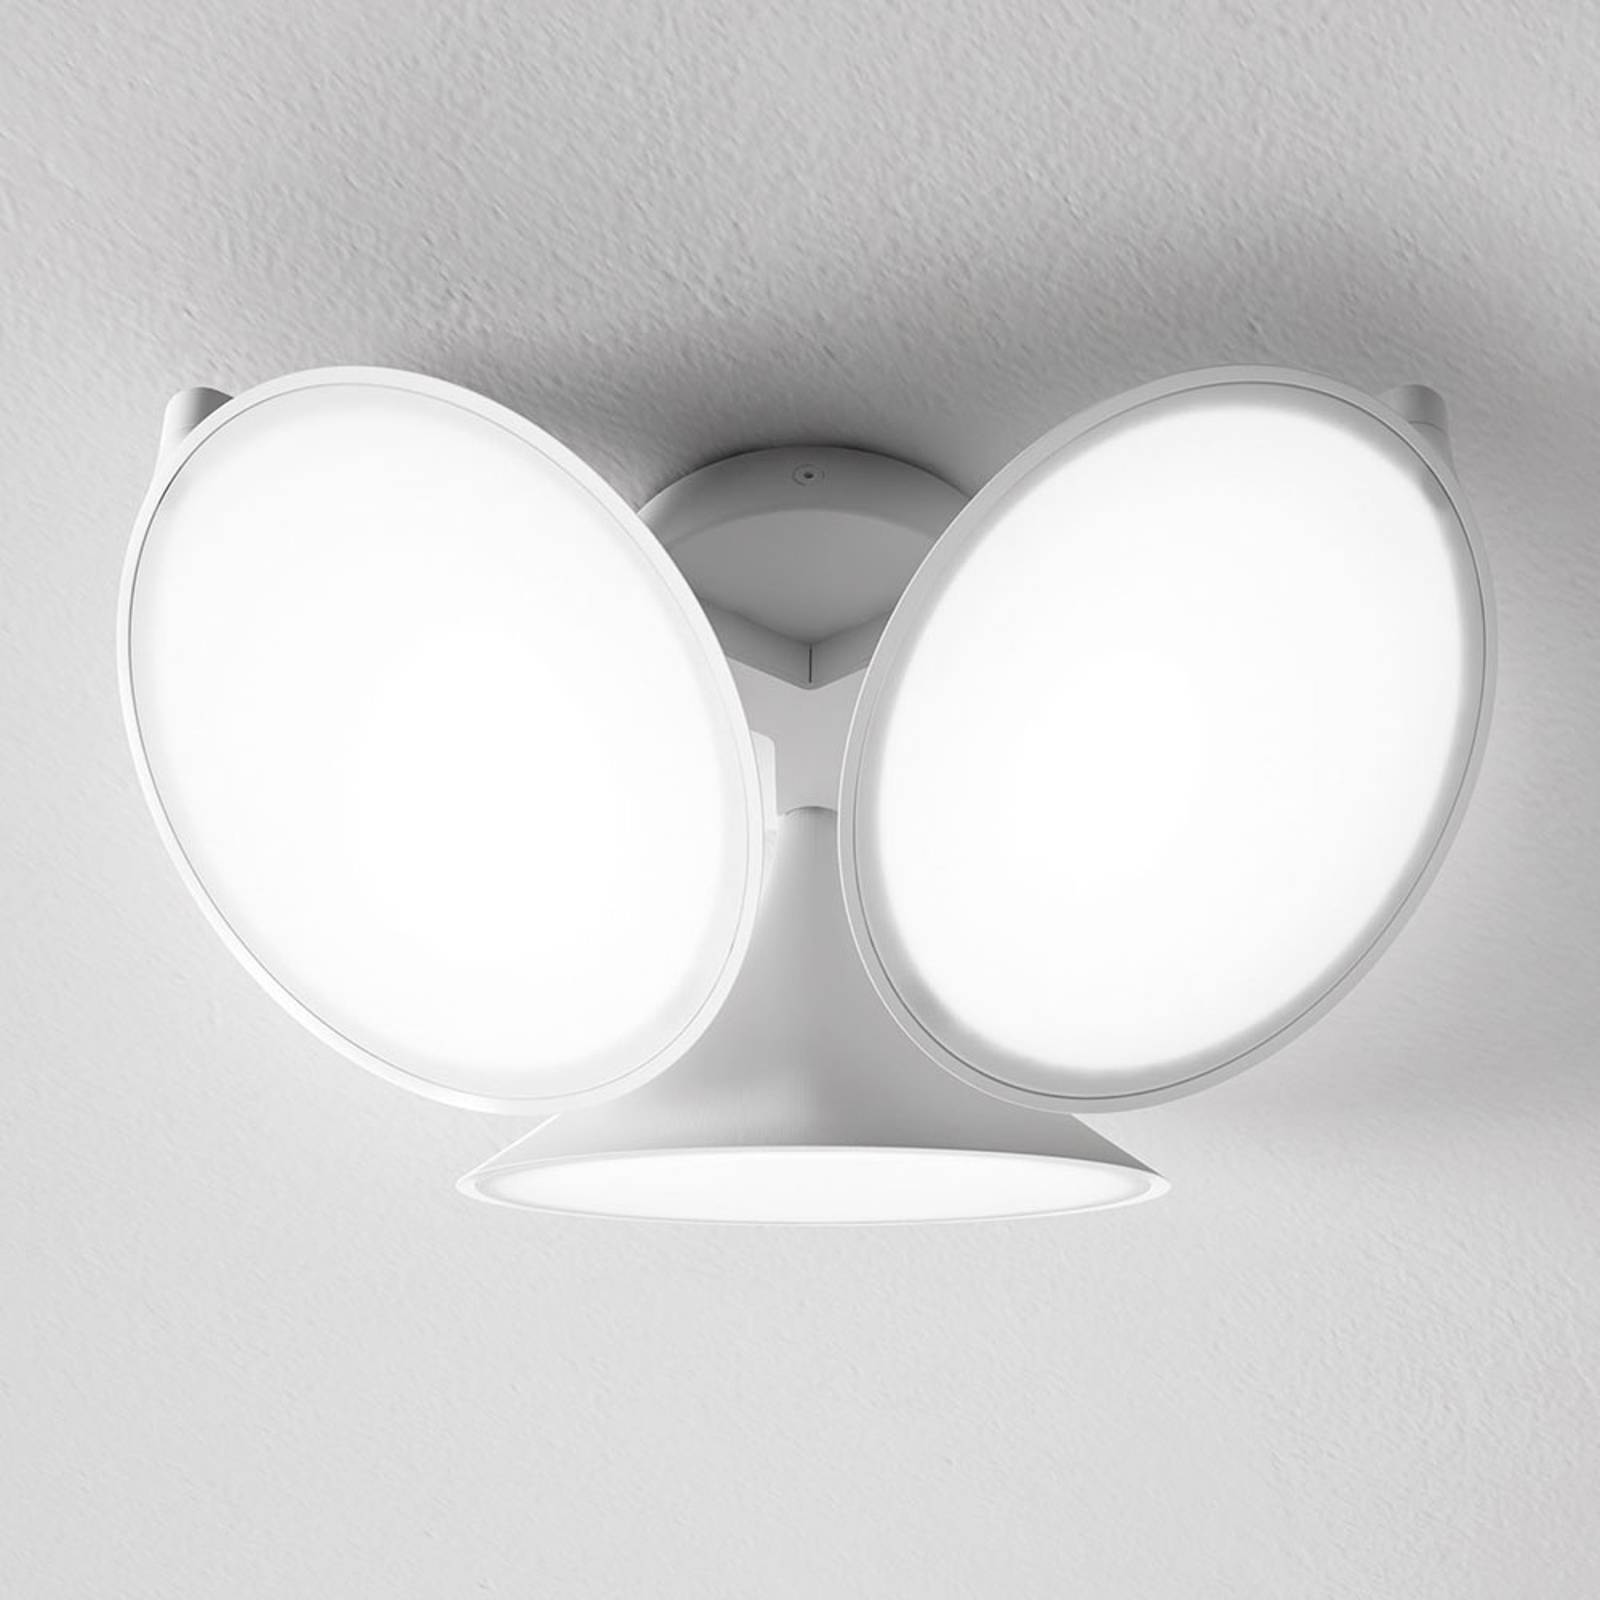 Axolight Orchid LED plafondlamp, wit